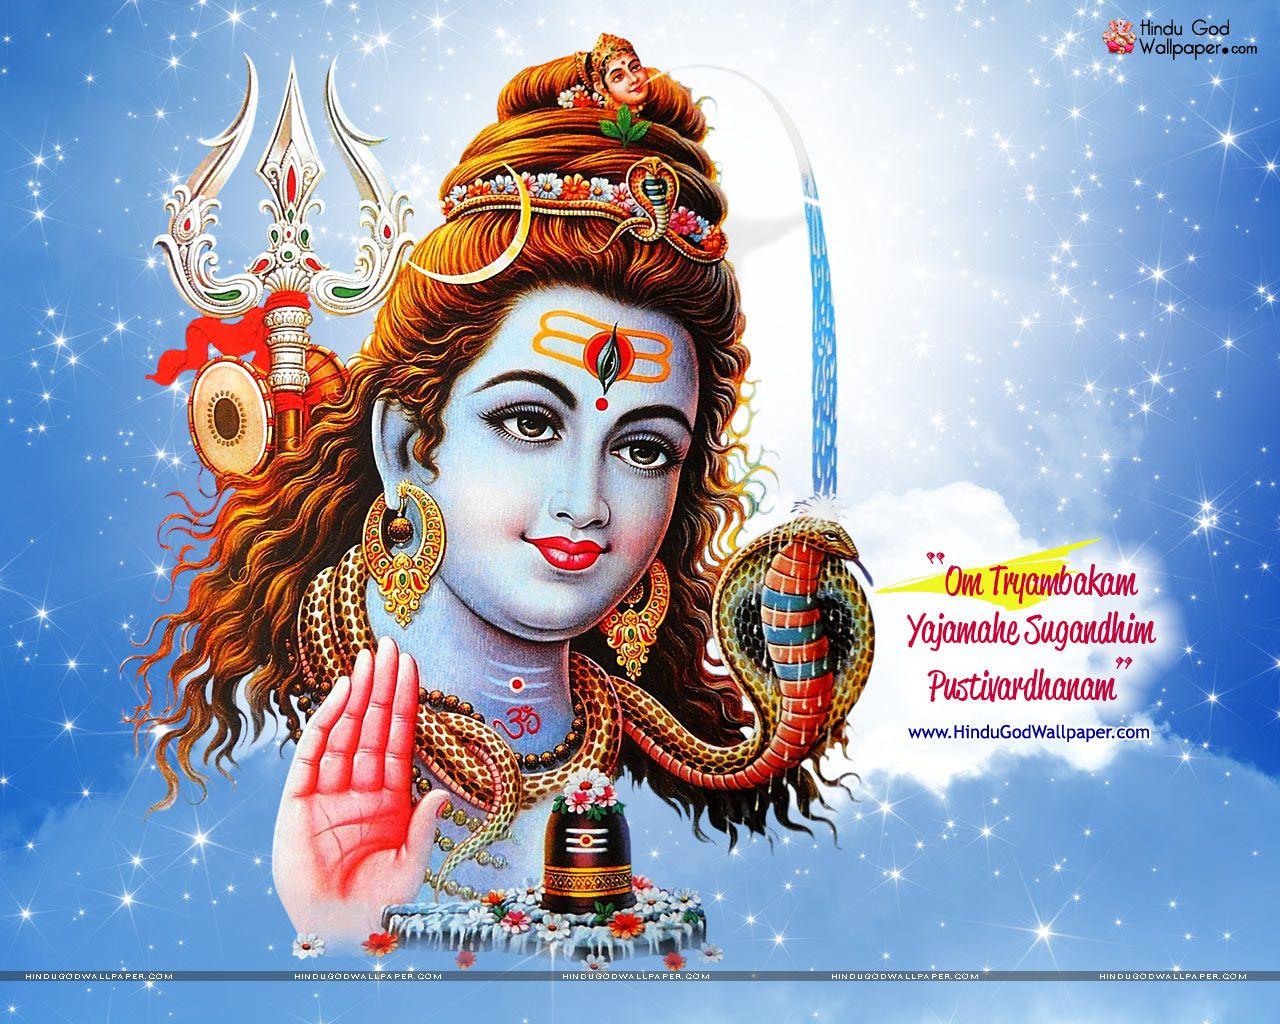 Maha Shivaratri Wallpaper With Quotes Free Download Wallpaper